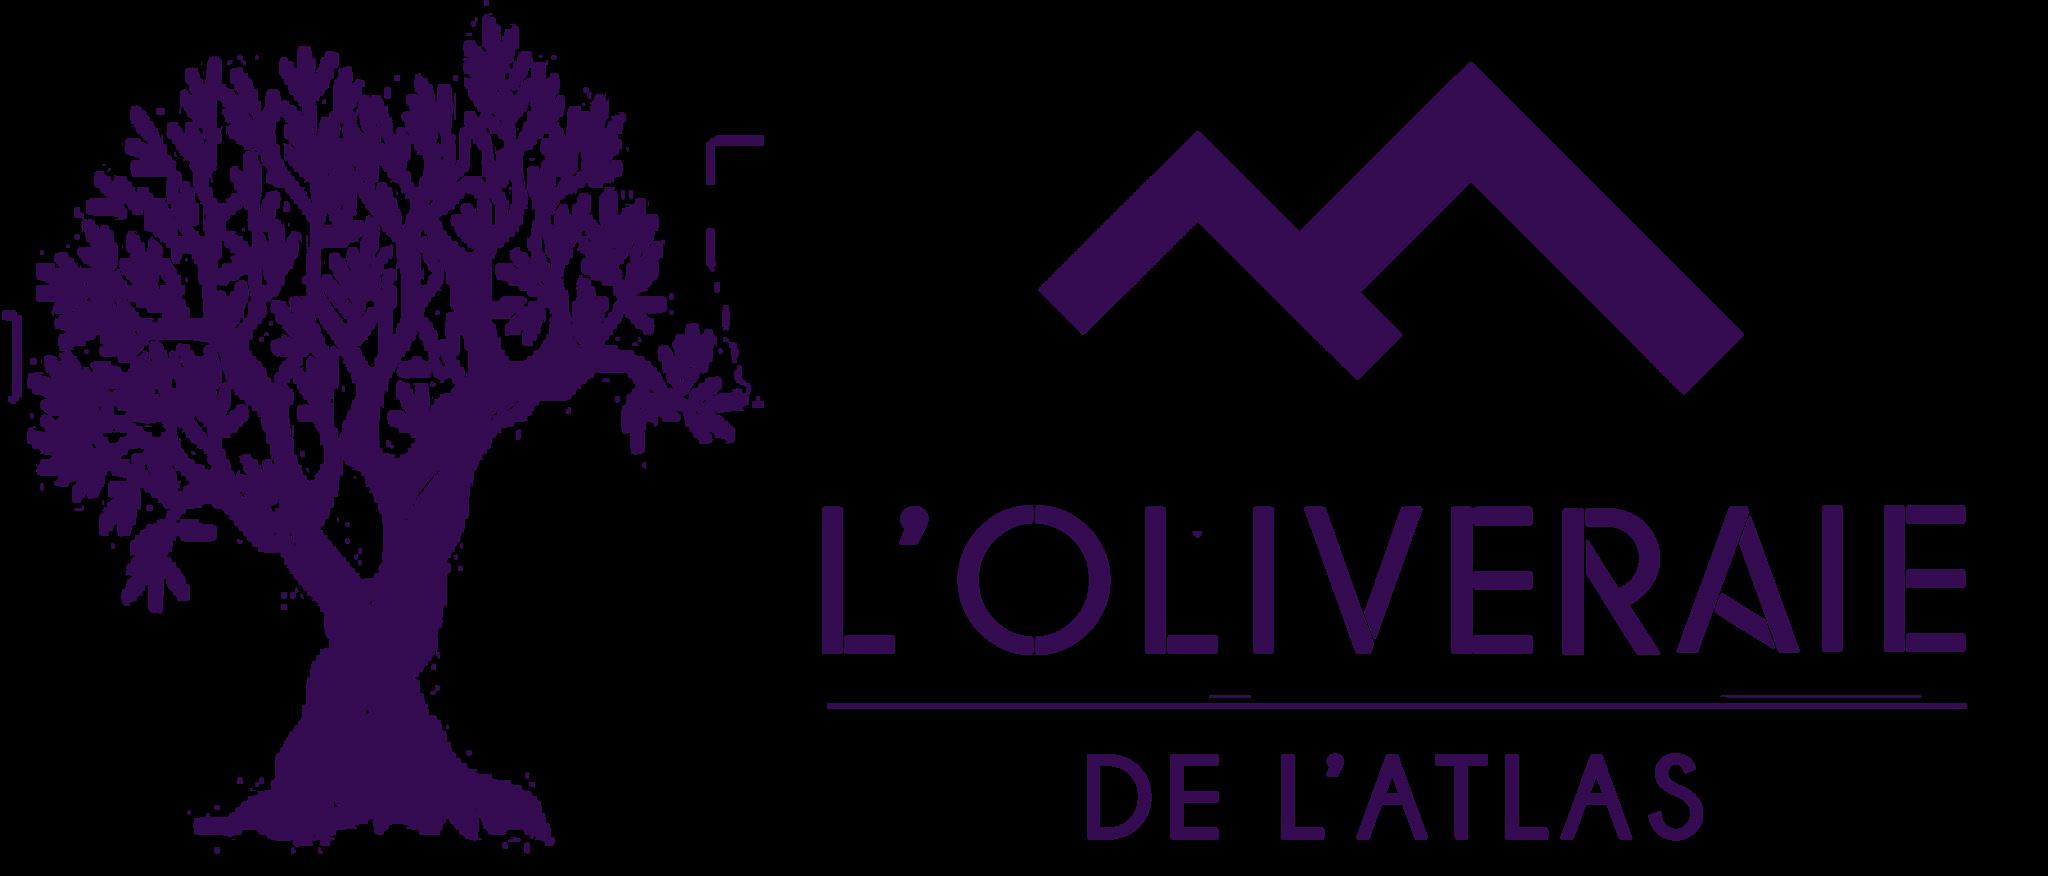 L'OLIVERAIE DE L'ATLAS – RIAD HOTEL DE LUXE à Marrakech, Maroc